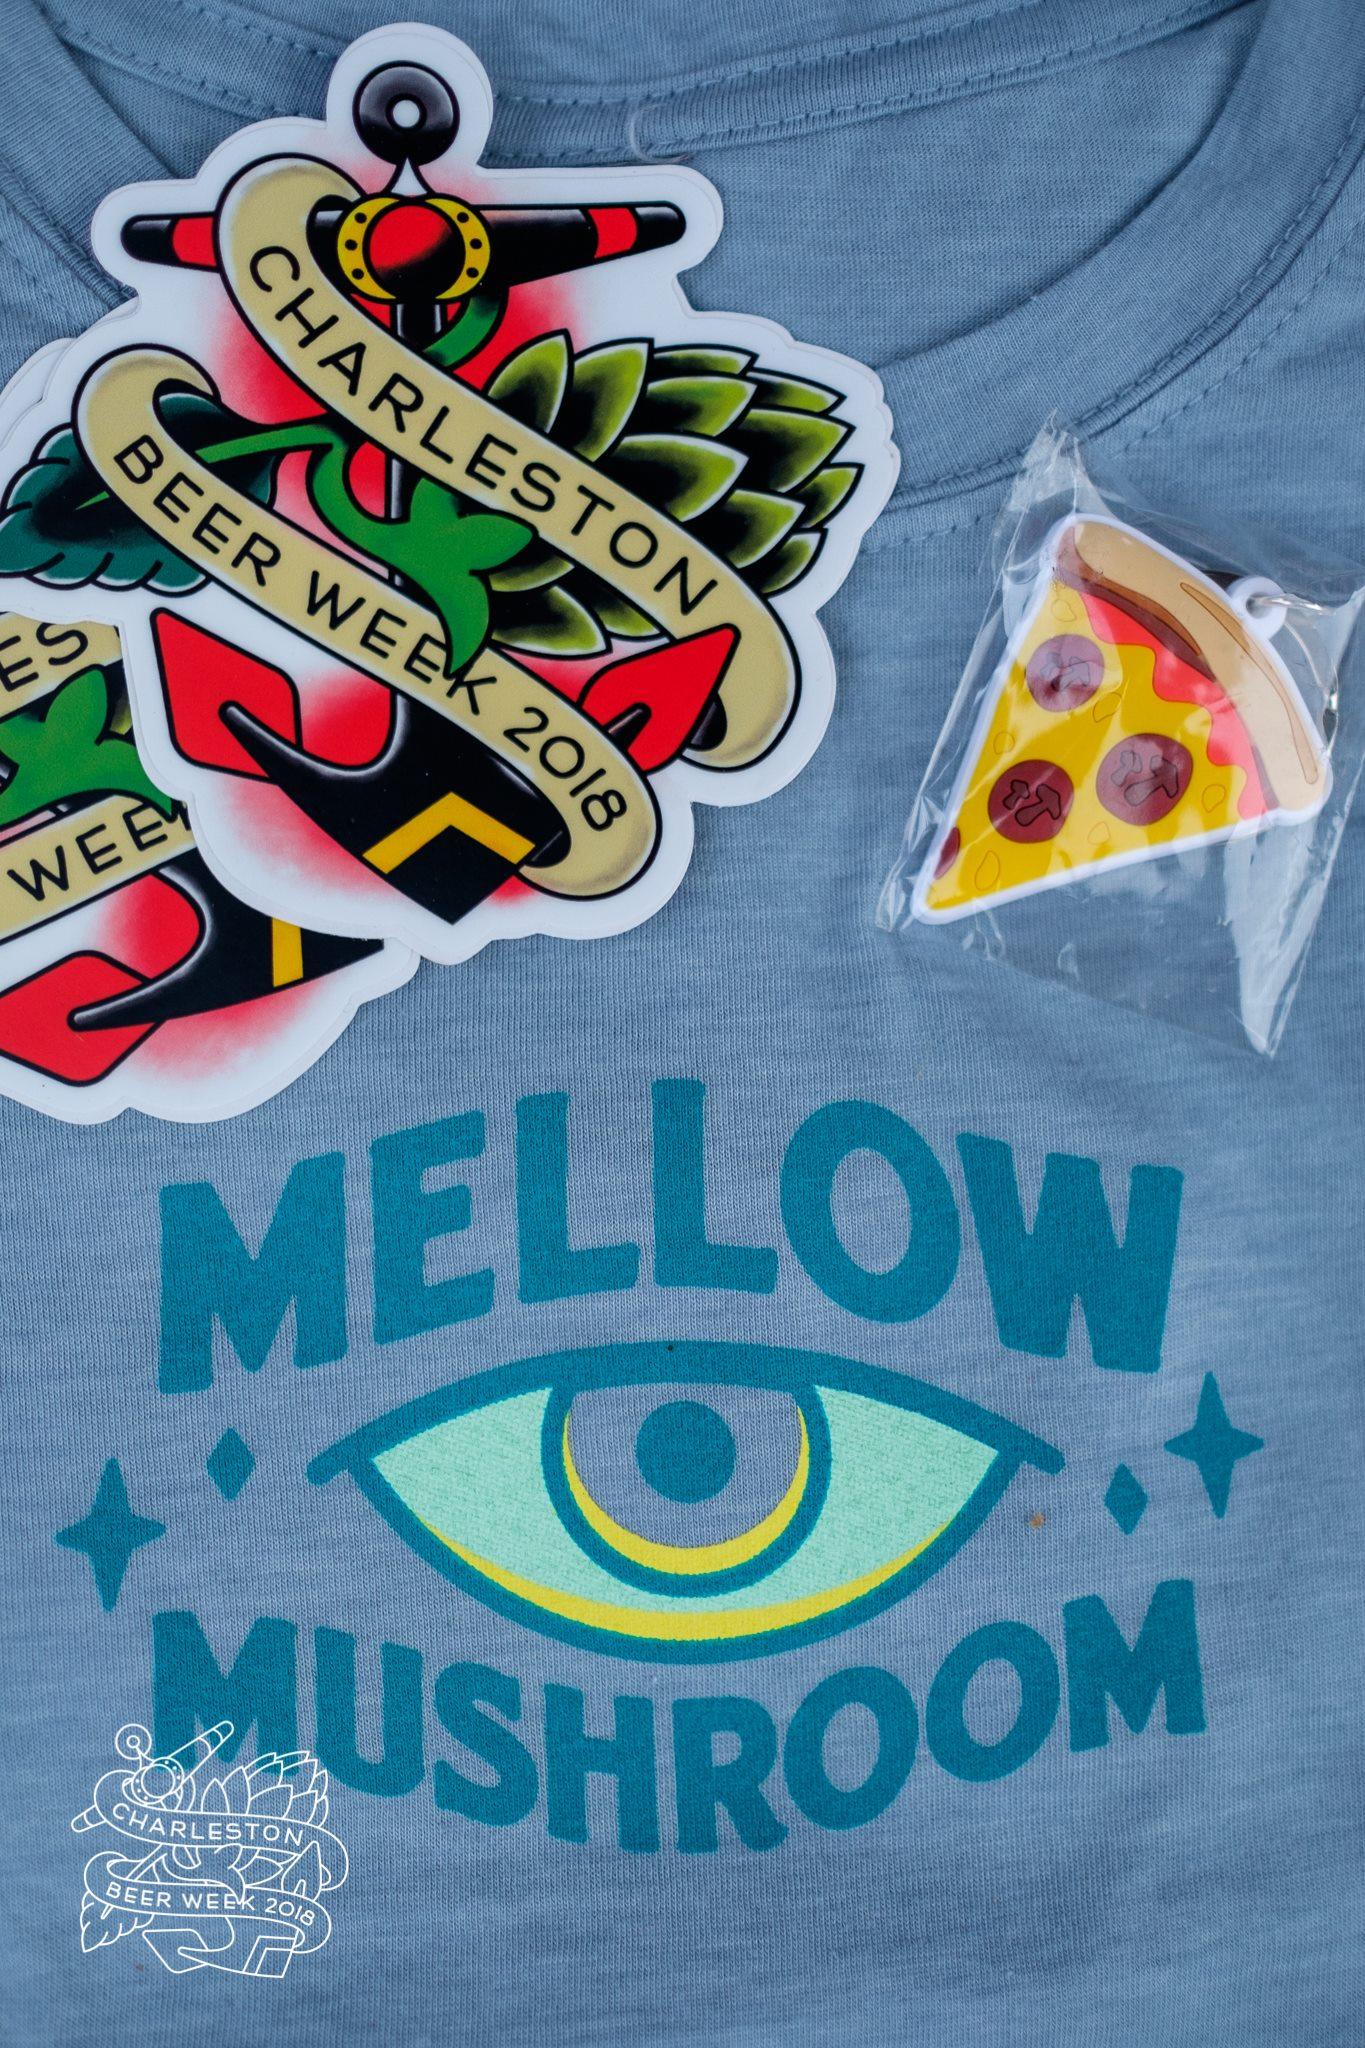 Mellow Mushroom supports 2018 Charleston Beer Week